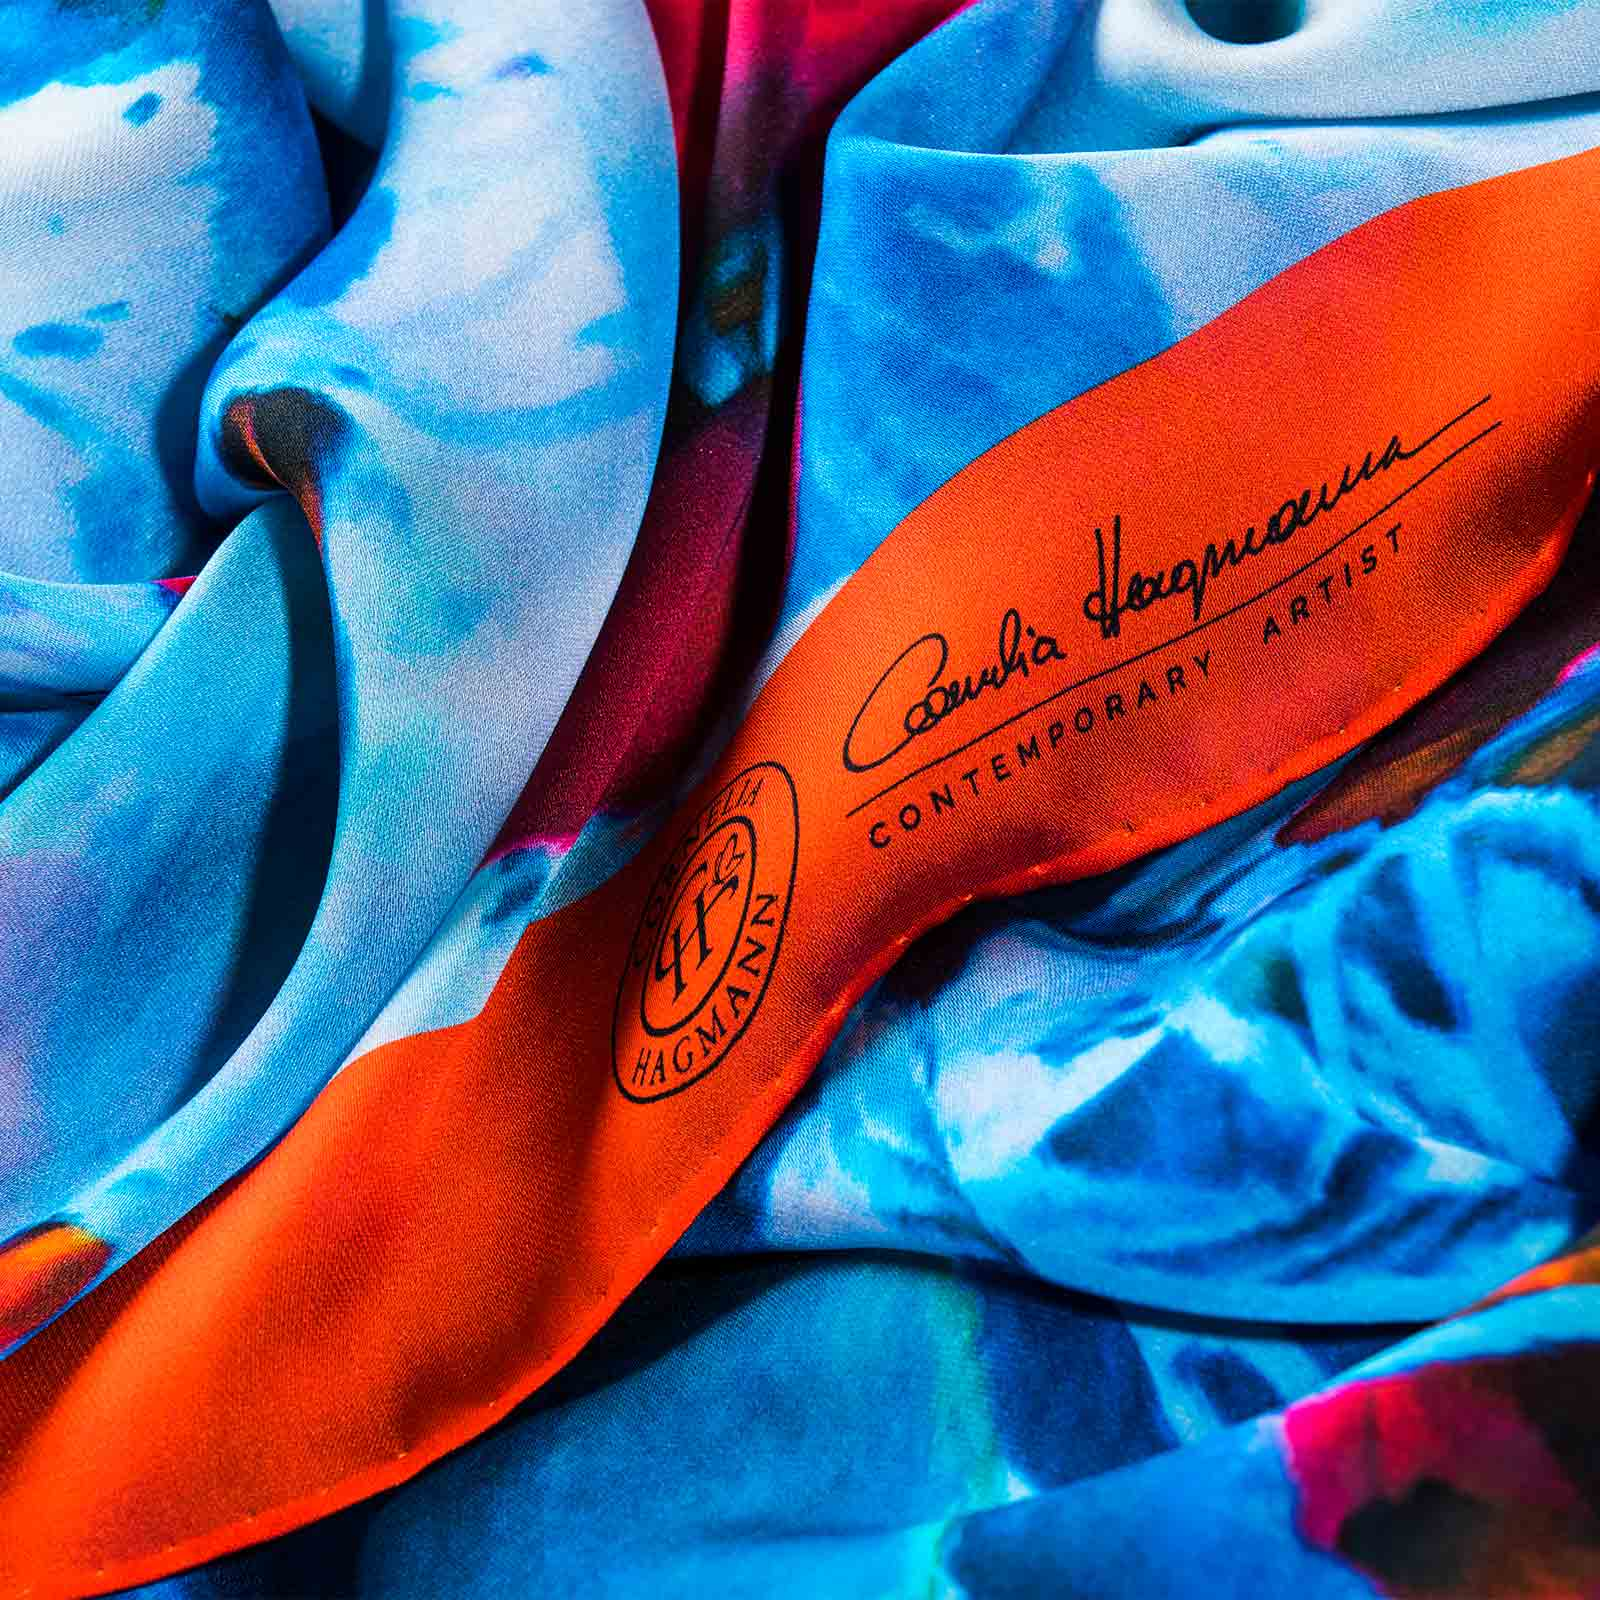 Cornelia Hagmann Contemporary Artist La Galleria Silk Scarf Miracle Flowers Red, Seidenschal, sciarpa di seta, foulard soie,